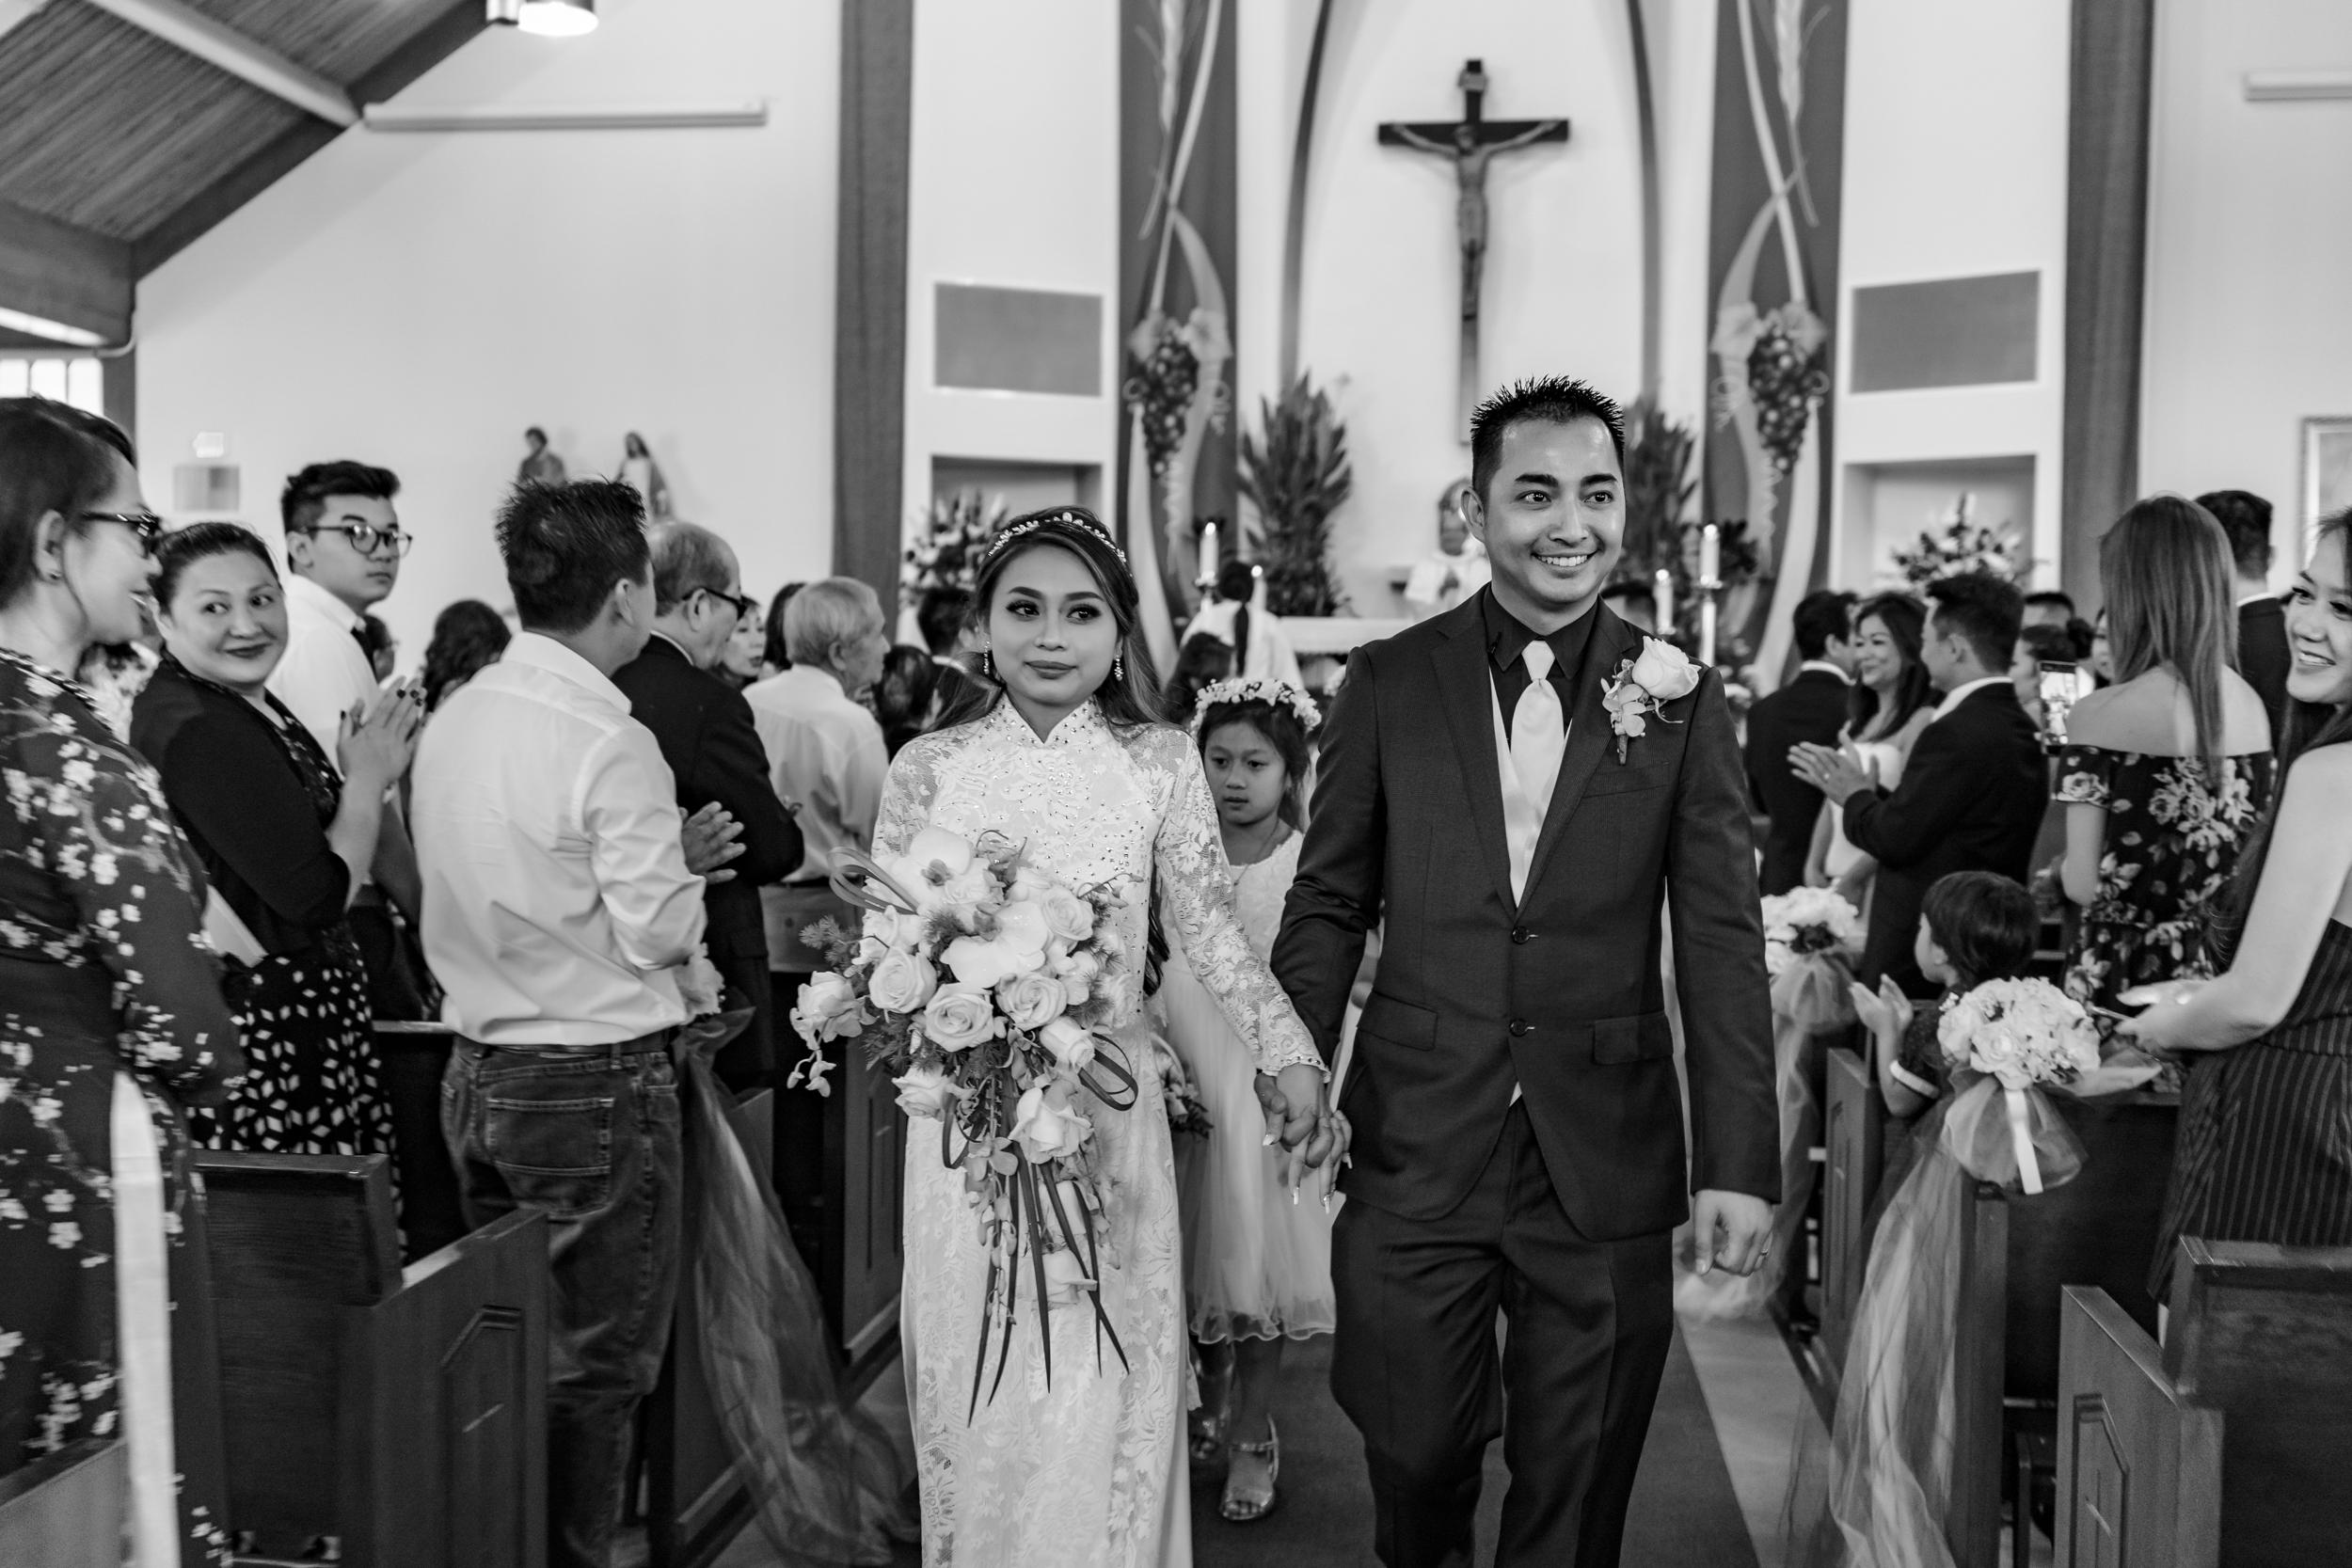 Huong + Antz Nguyen | Church Ceremony - Aug 11, 2018